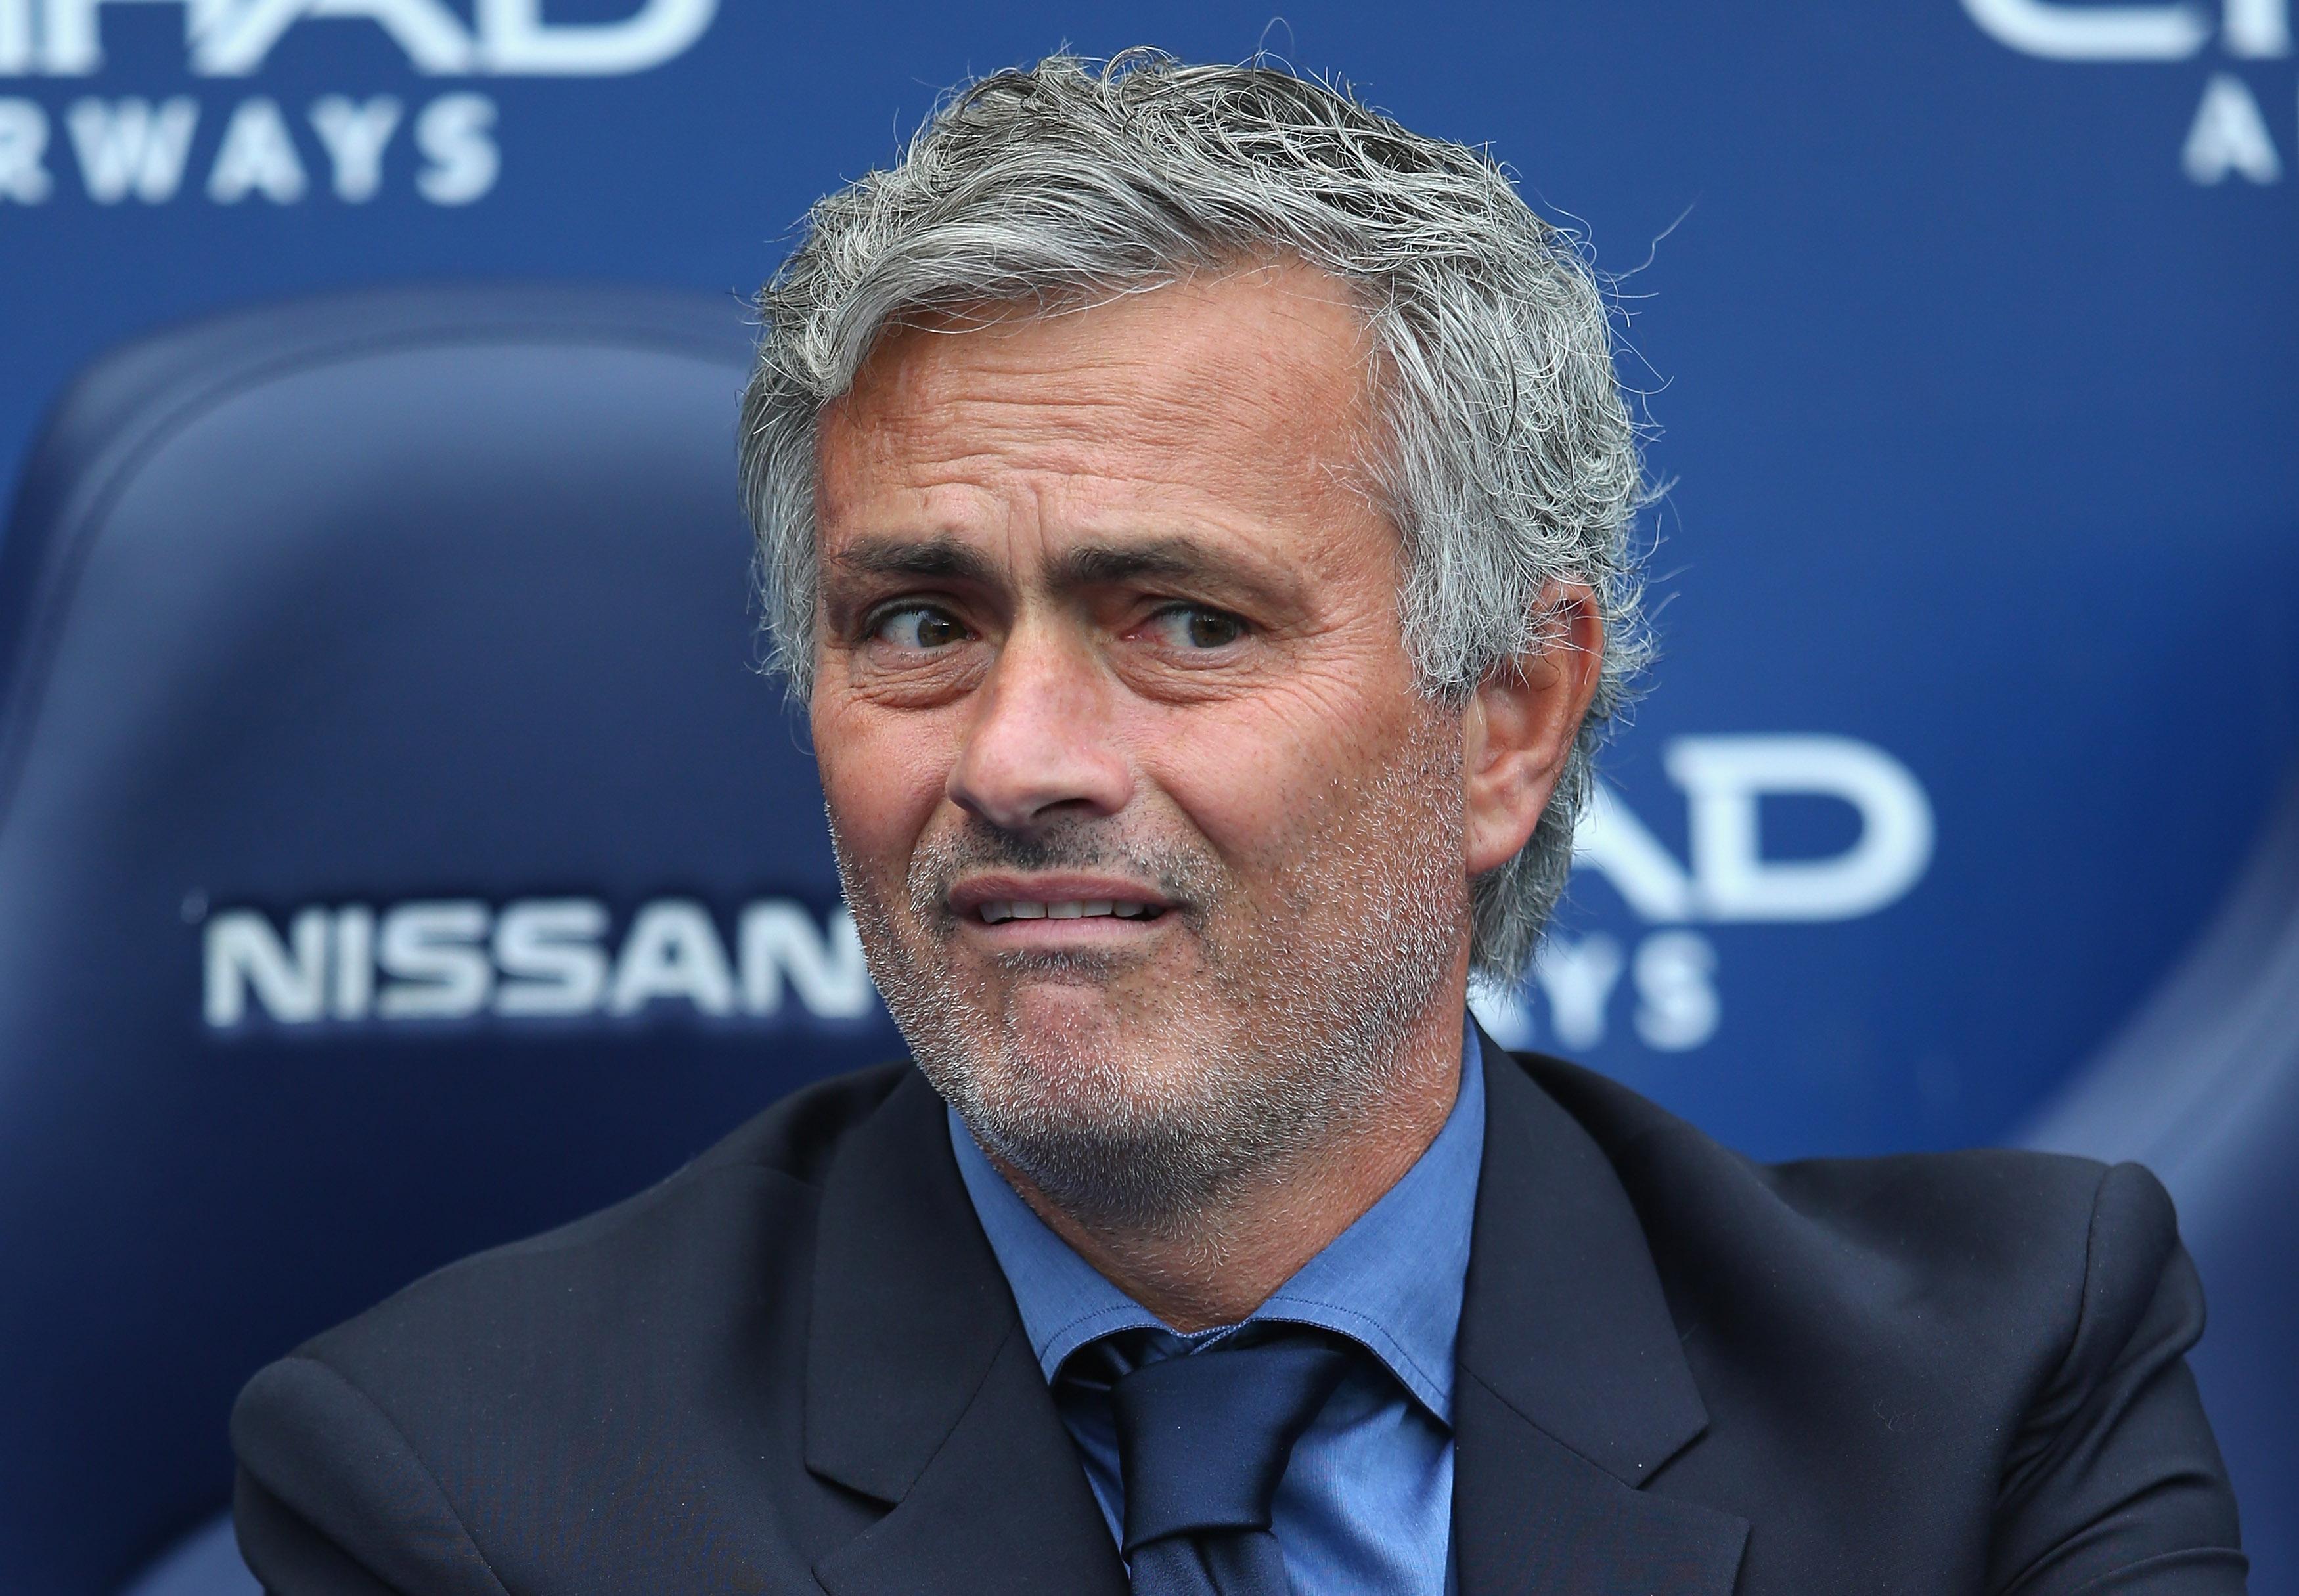 Manchester United should replace Louis van Gaal with Ronald Koeman NOT Jose Mourinho, says Rene Meulensteen